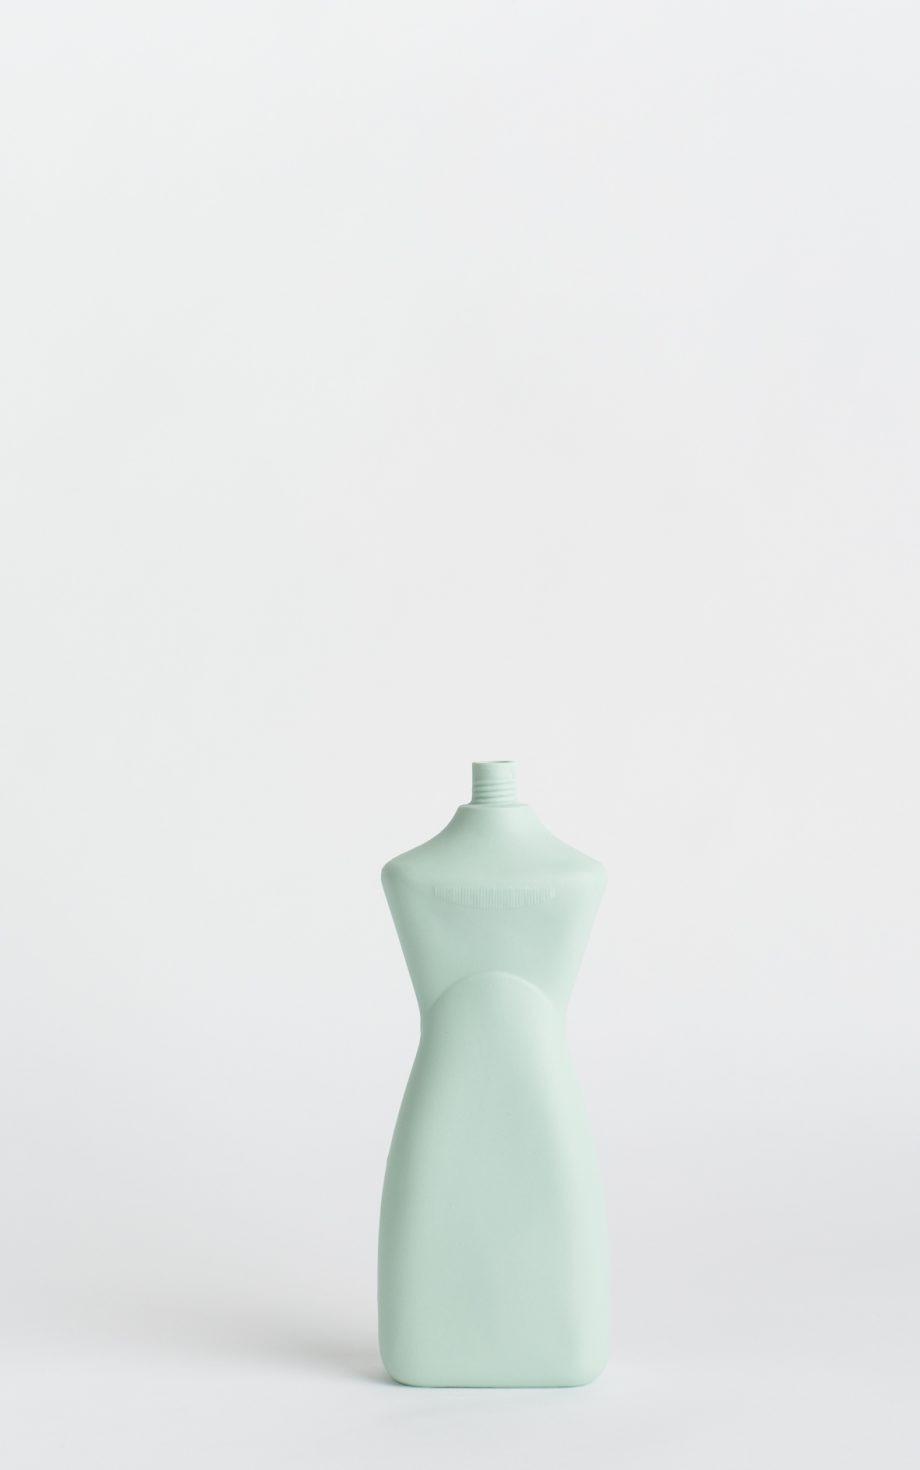 bottle vase #8 mint